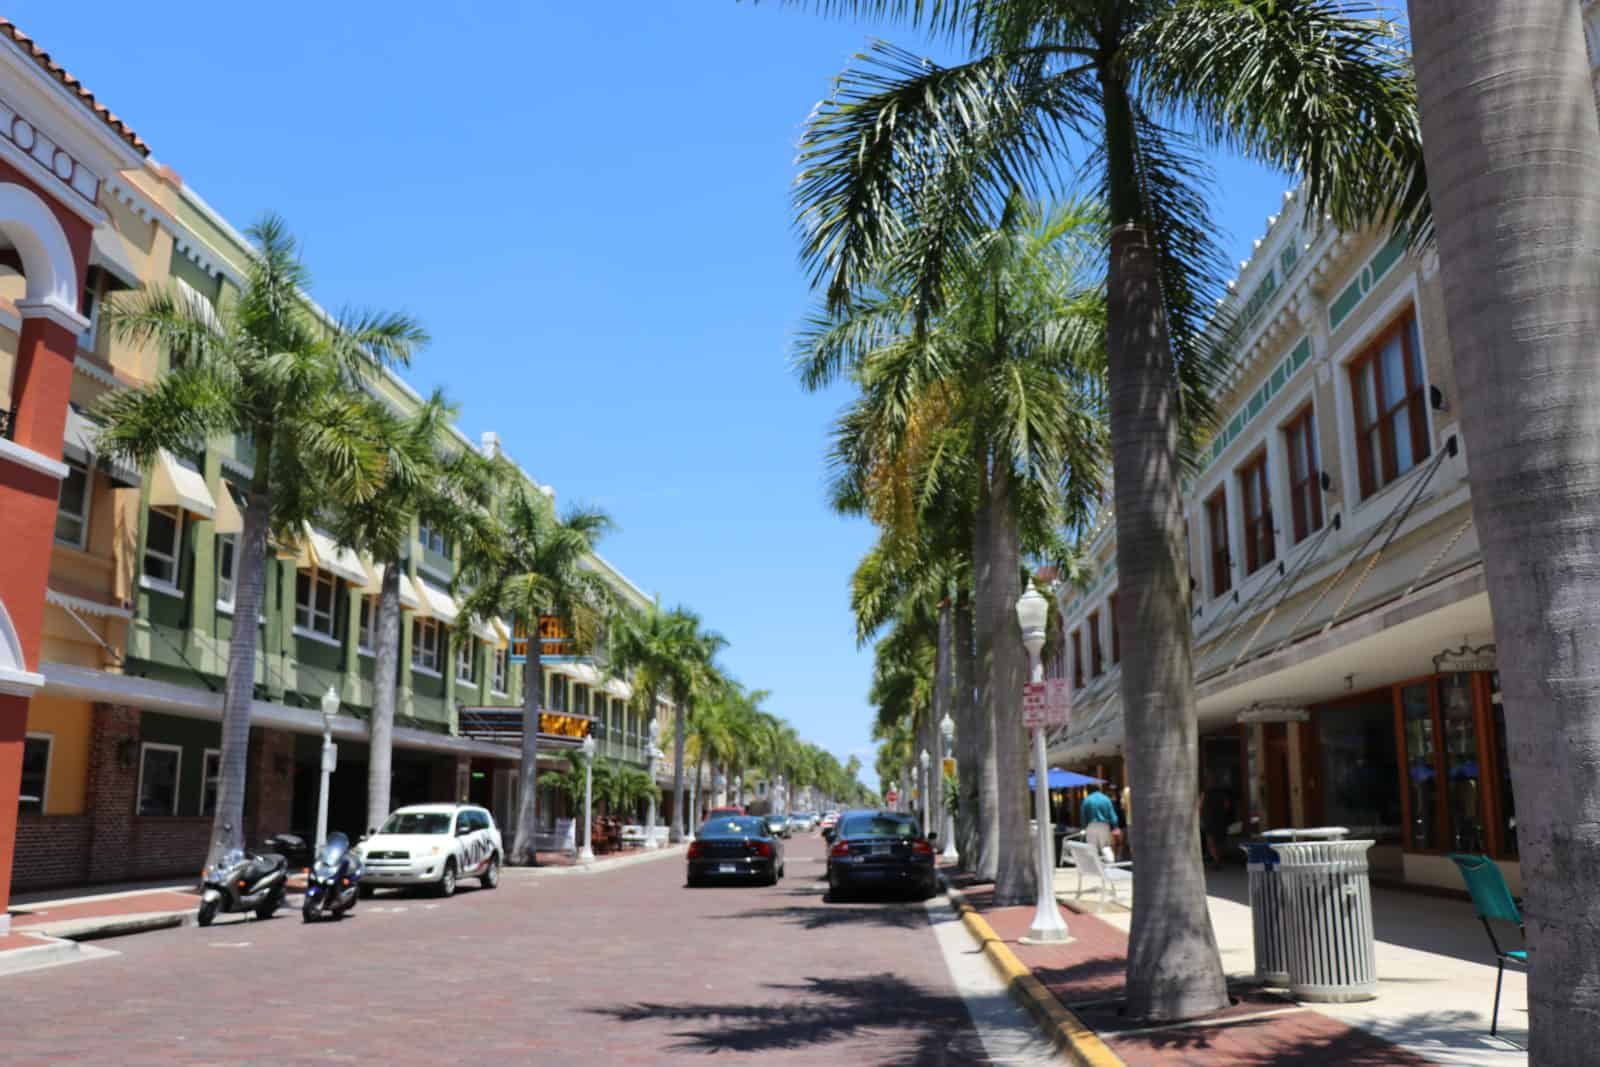 Green & Co. Business Brokers- Leading Business Broker in Southwest, Central & West Central Florida, Serving Naples, Fort Myers, Sarasota, Bradenton, Tampa Bay, St.Petersburg, Orlando... I Florida Business Broker I Businesses For Sale...